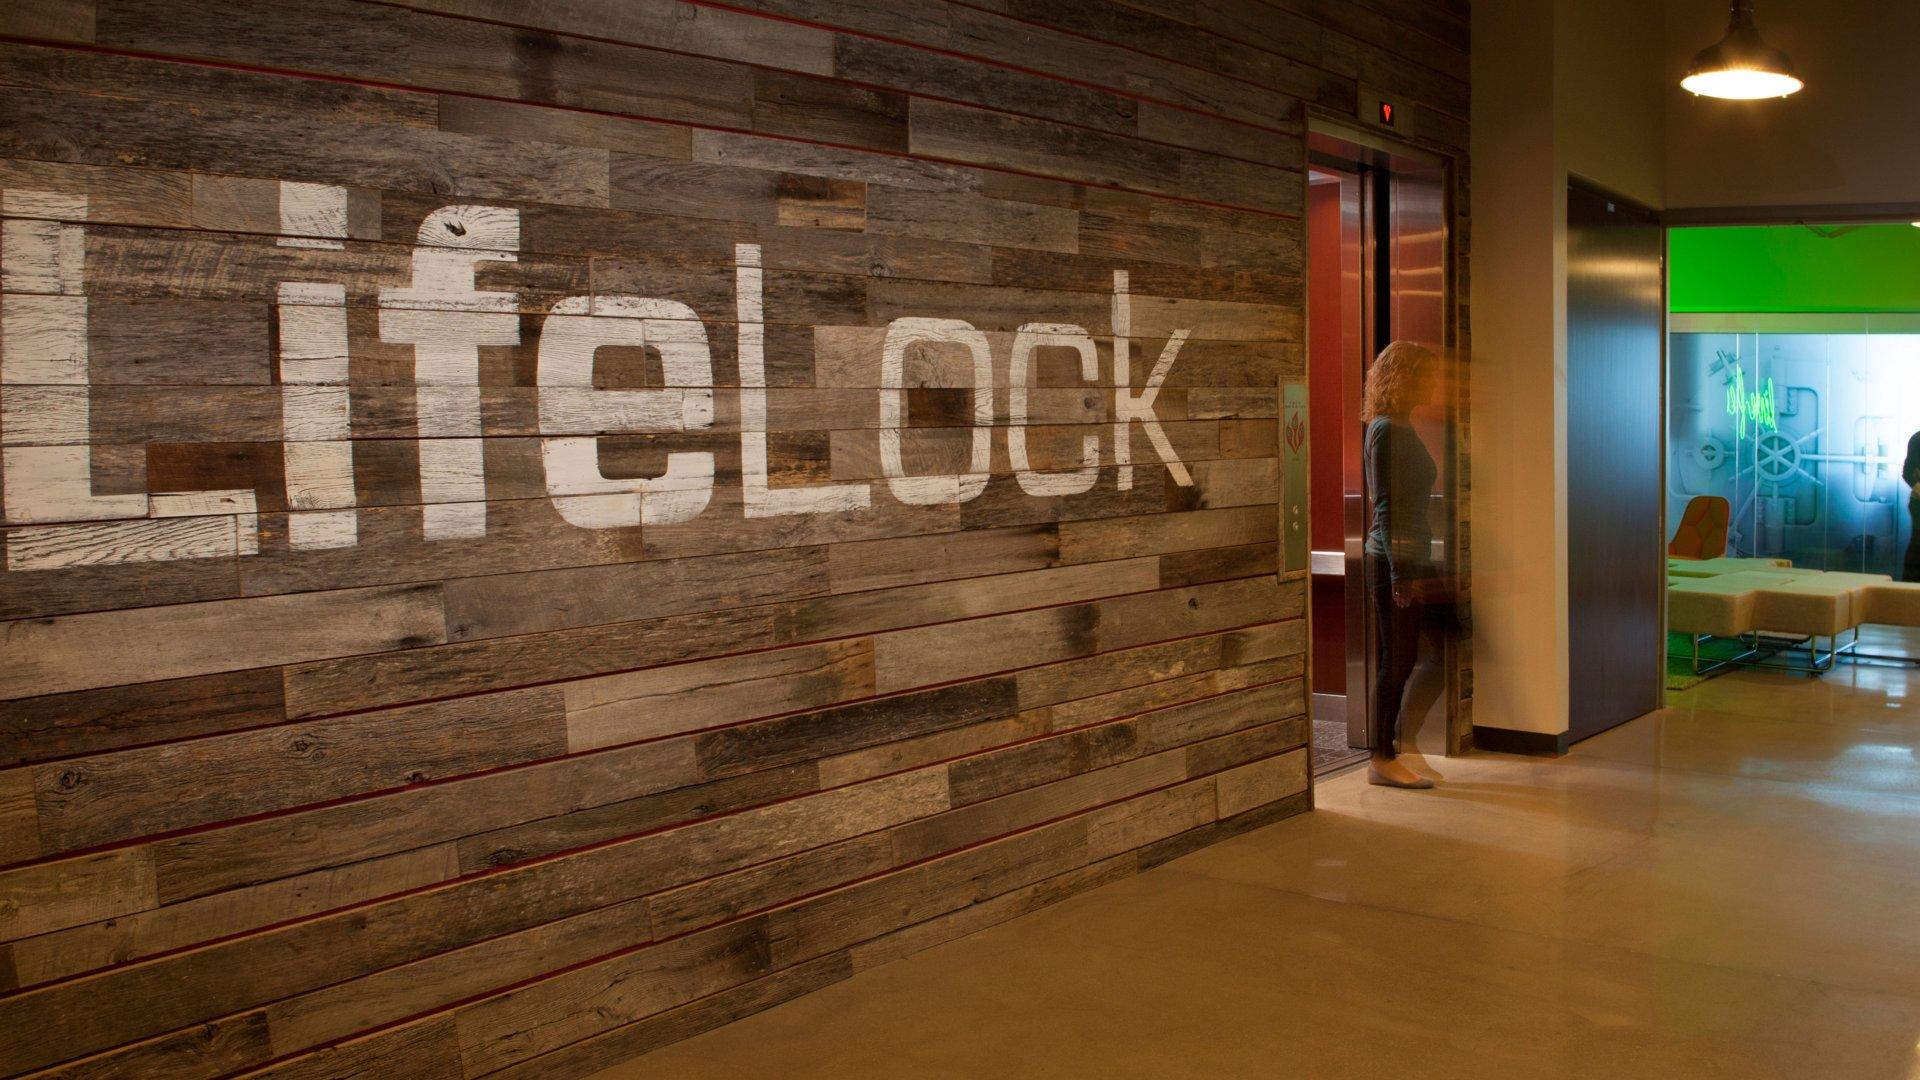 Symantec to Buy LifeLock for $2.3 Billion